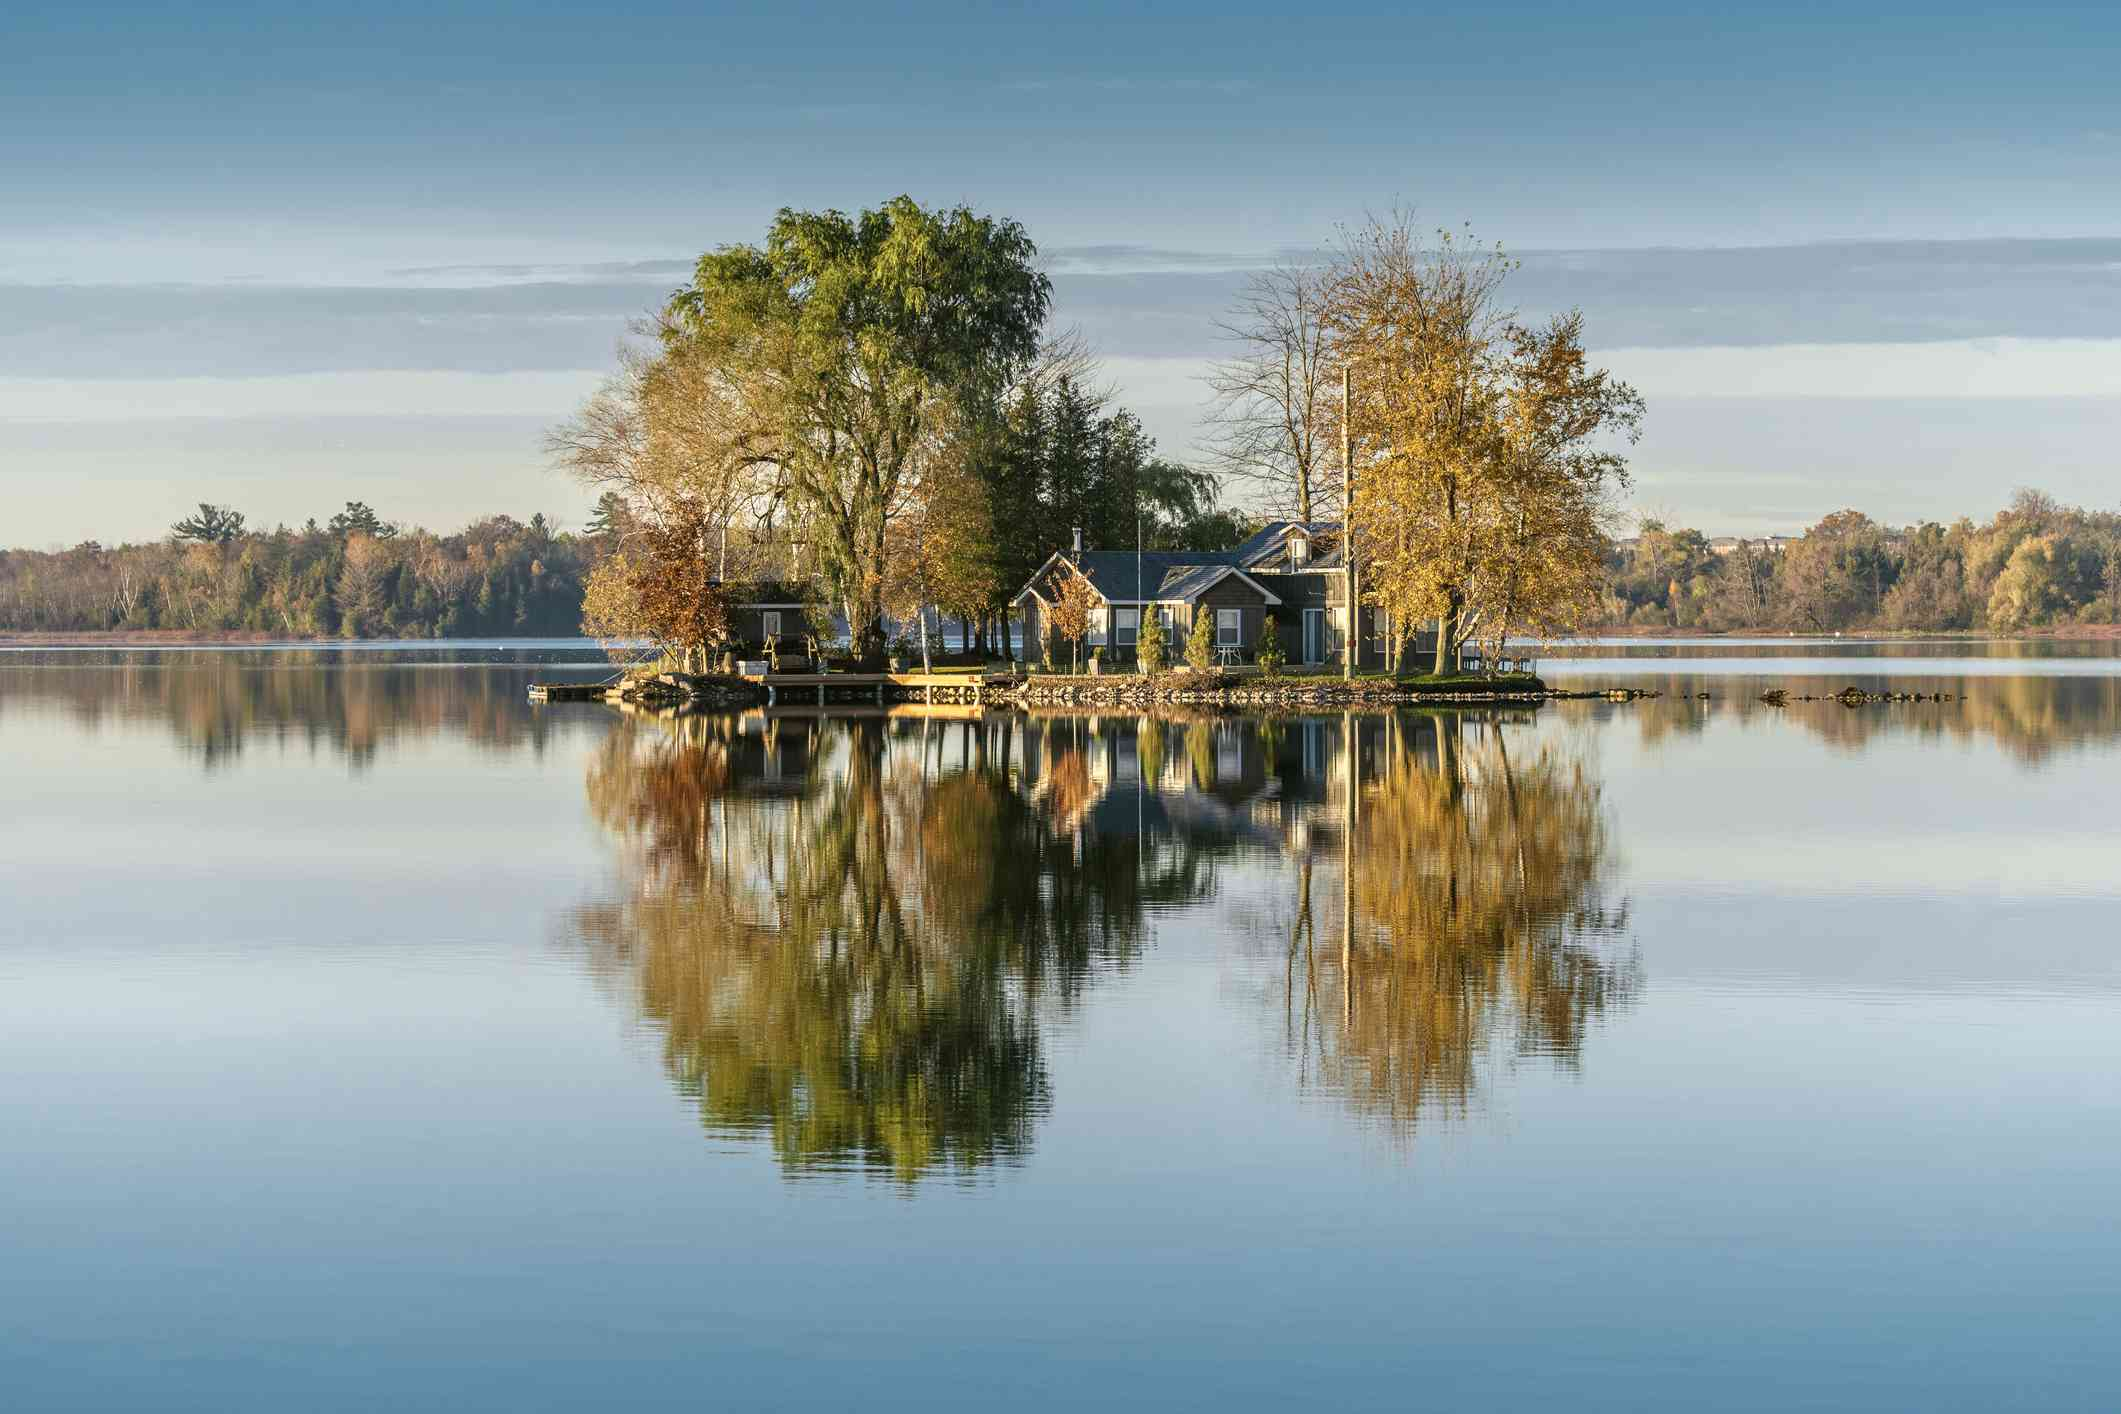 Small island on Puslinch Lake, Ontario